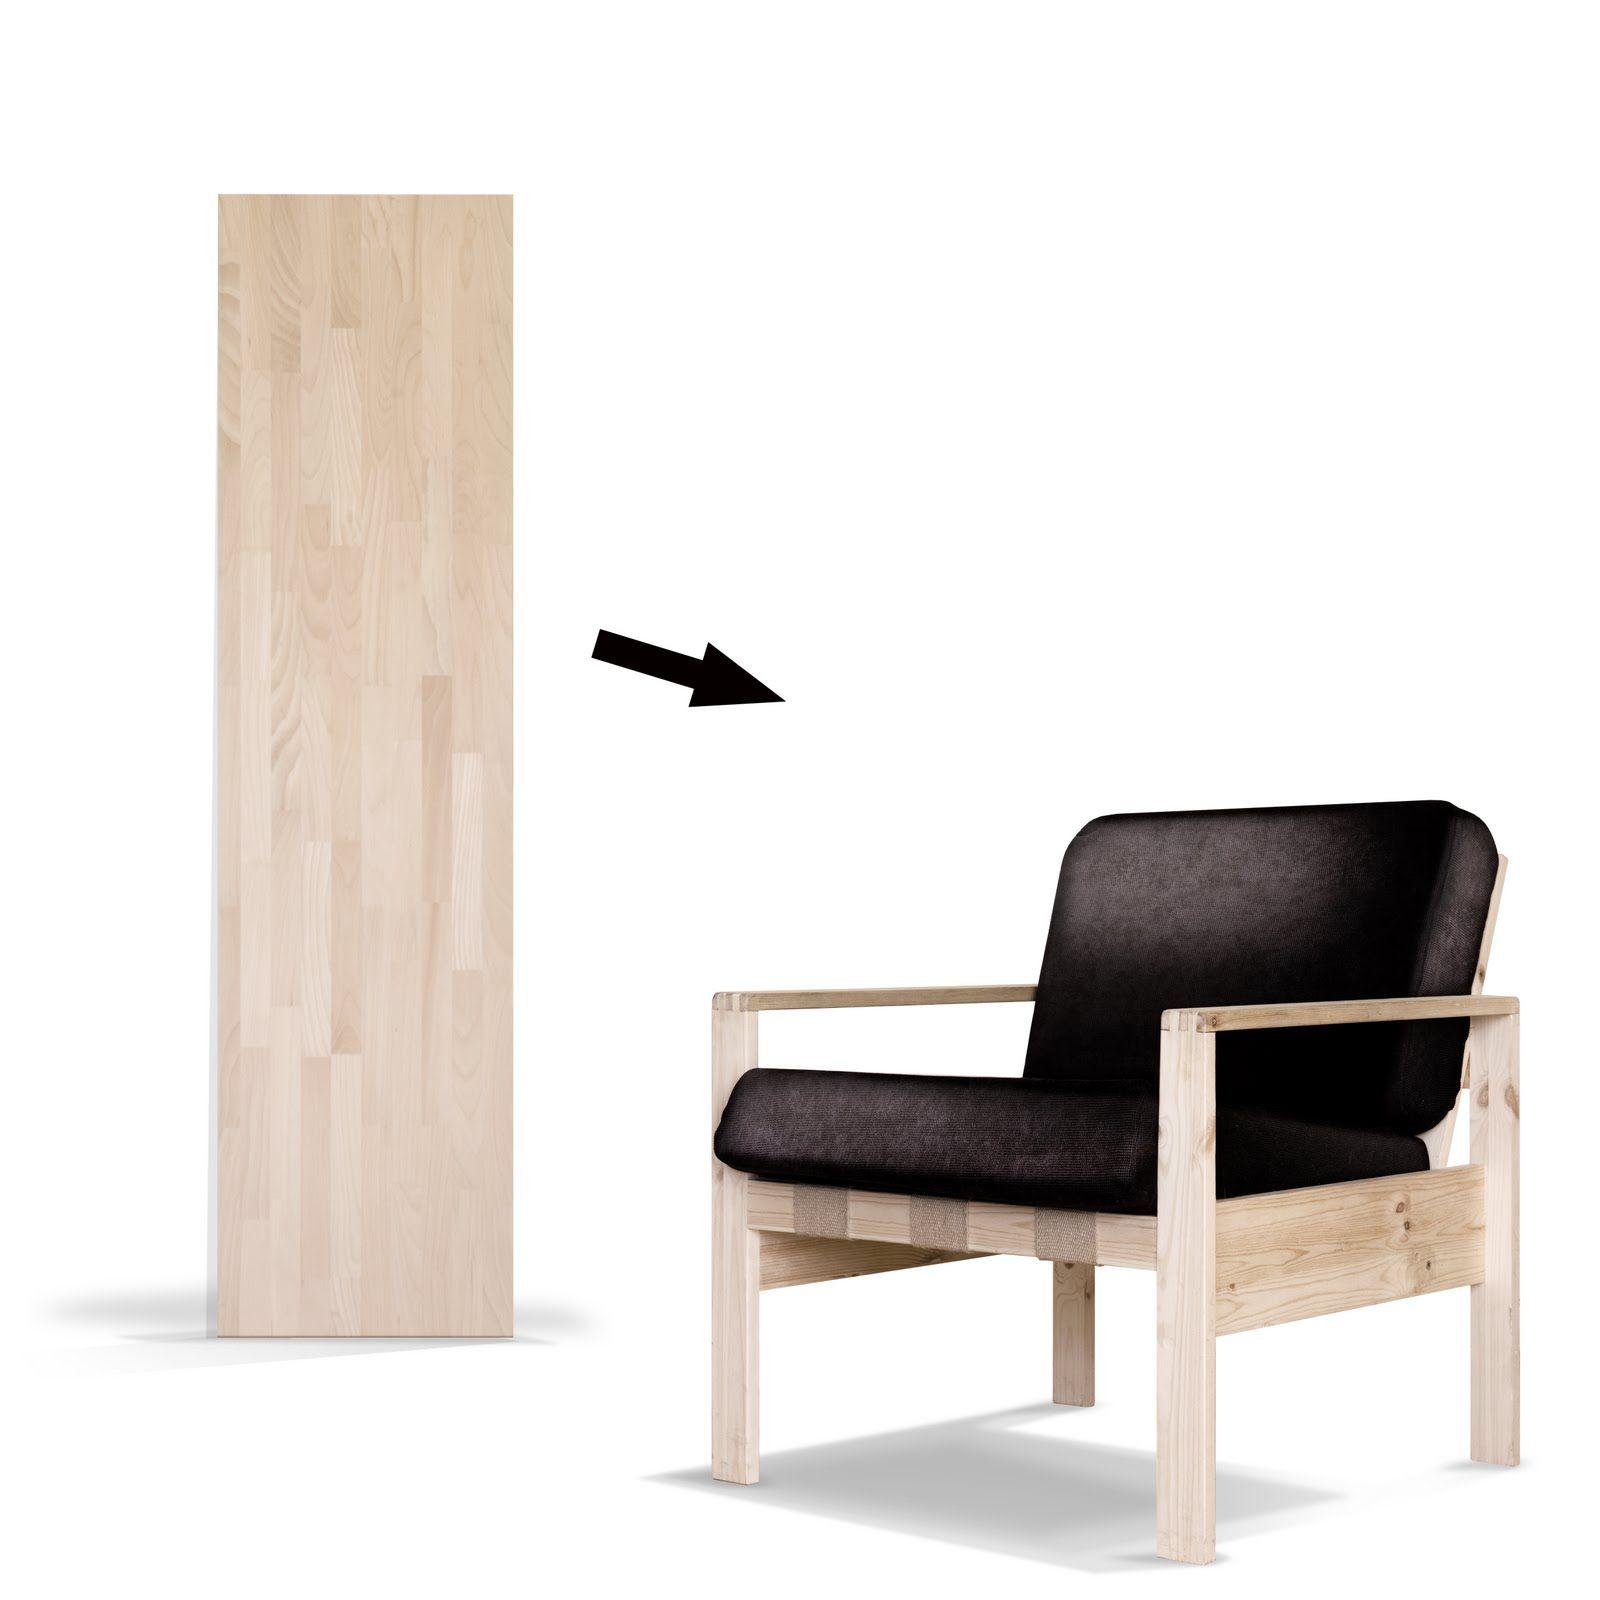 Hartz Iv Mobel 24 Euro Sessel 24 Euro Chair In 2020 Hartz Iv